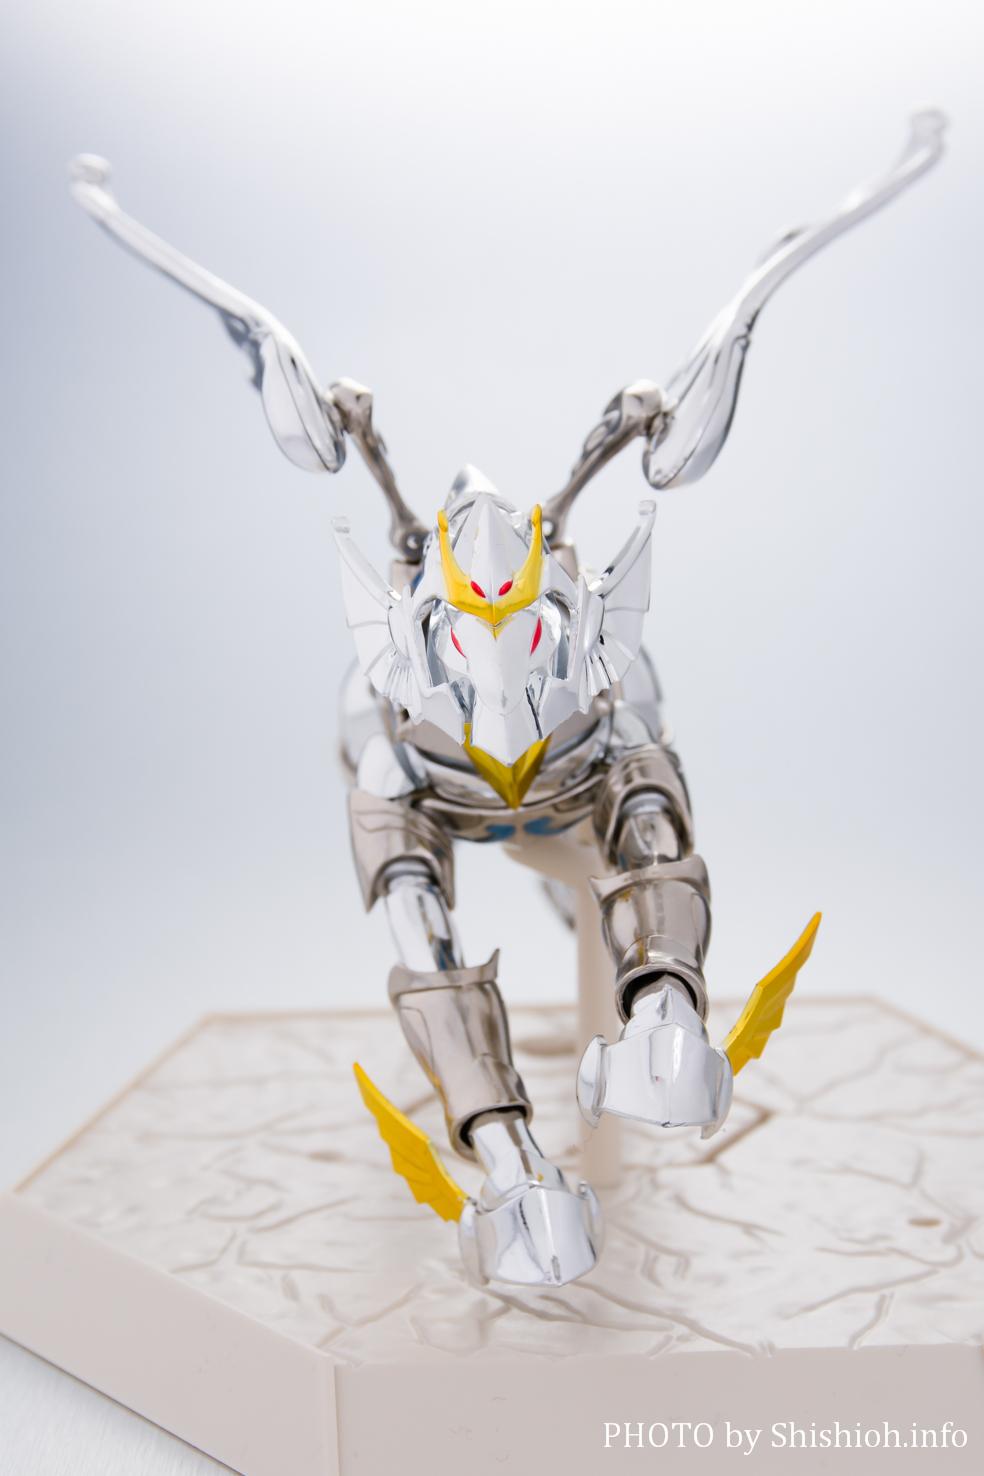 聖闘士聖衣神話ペガサス星矢(天界編)